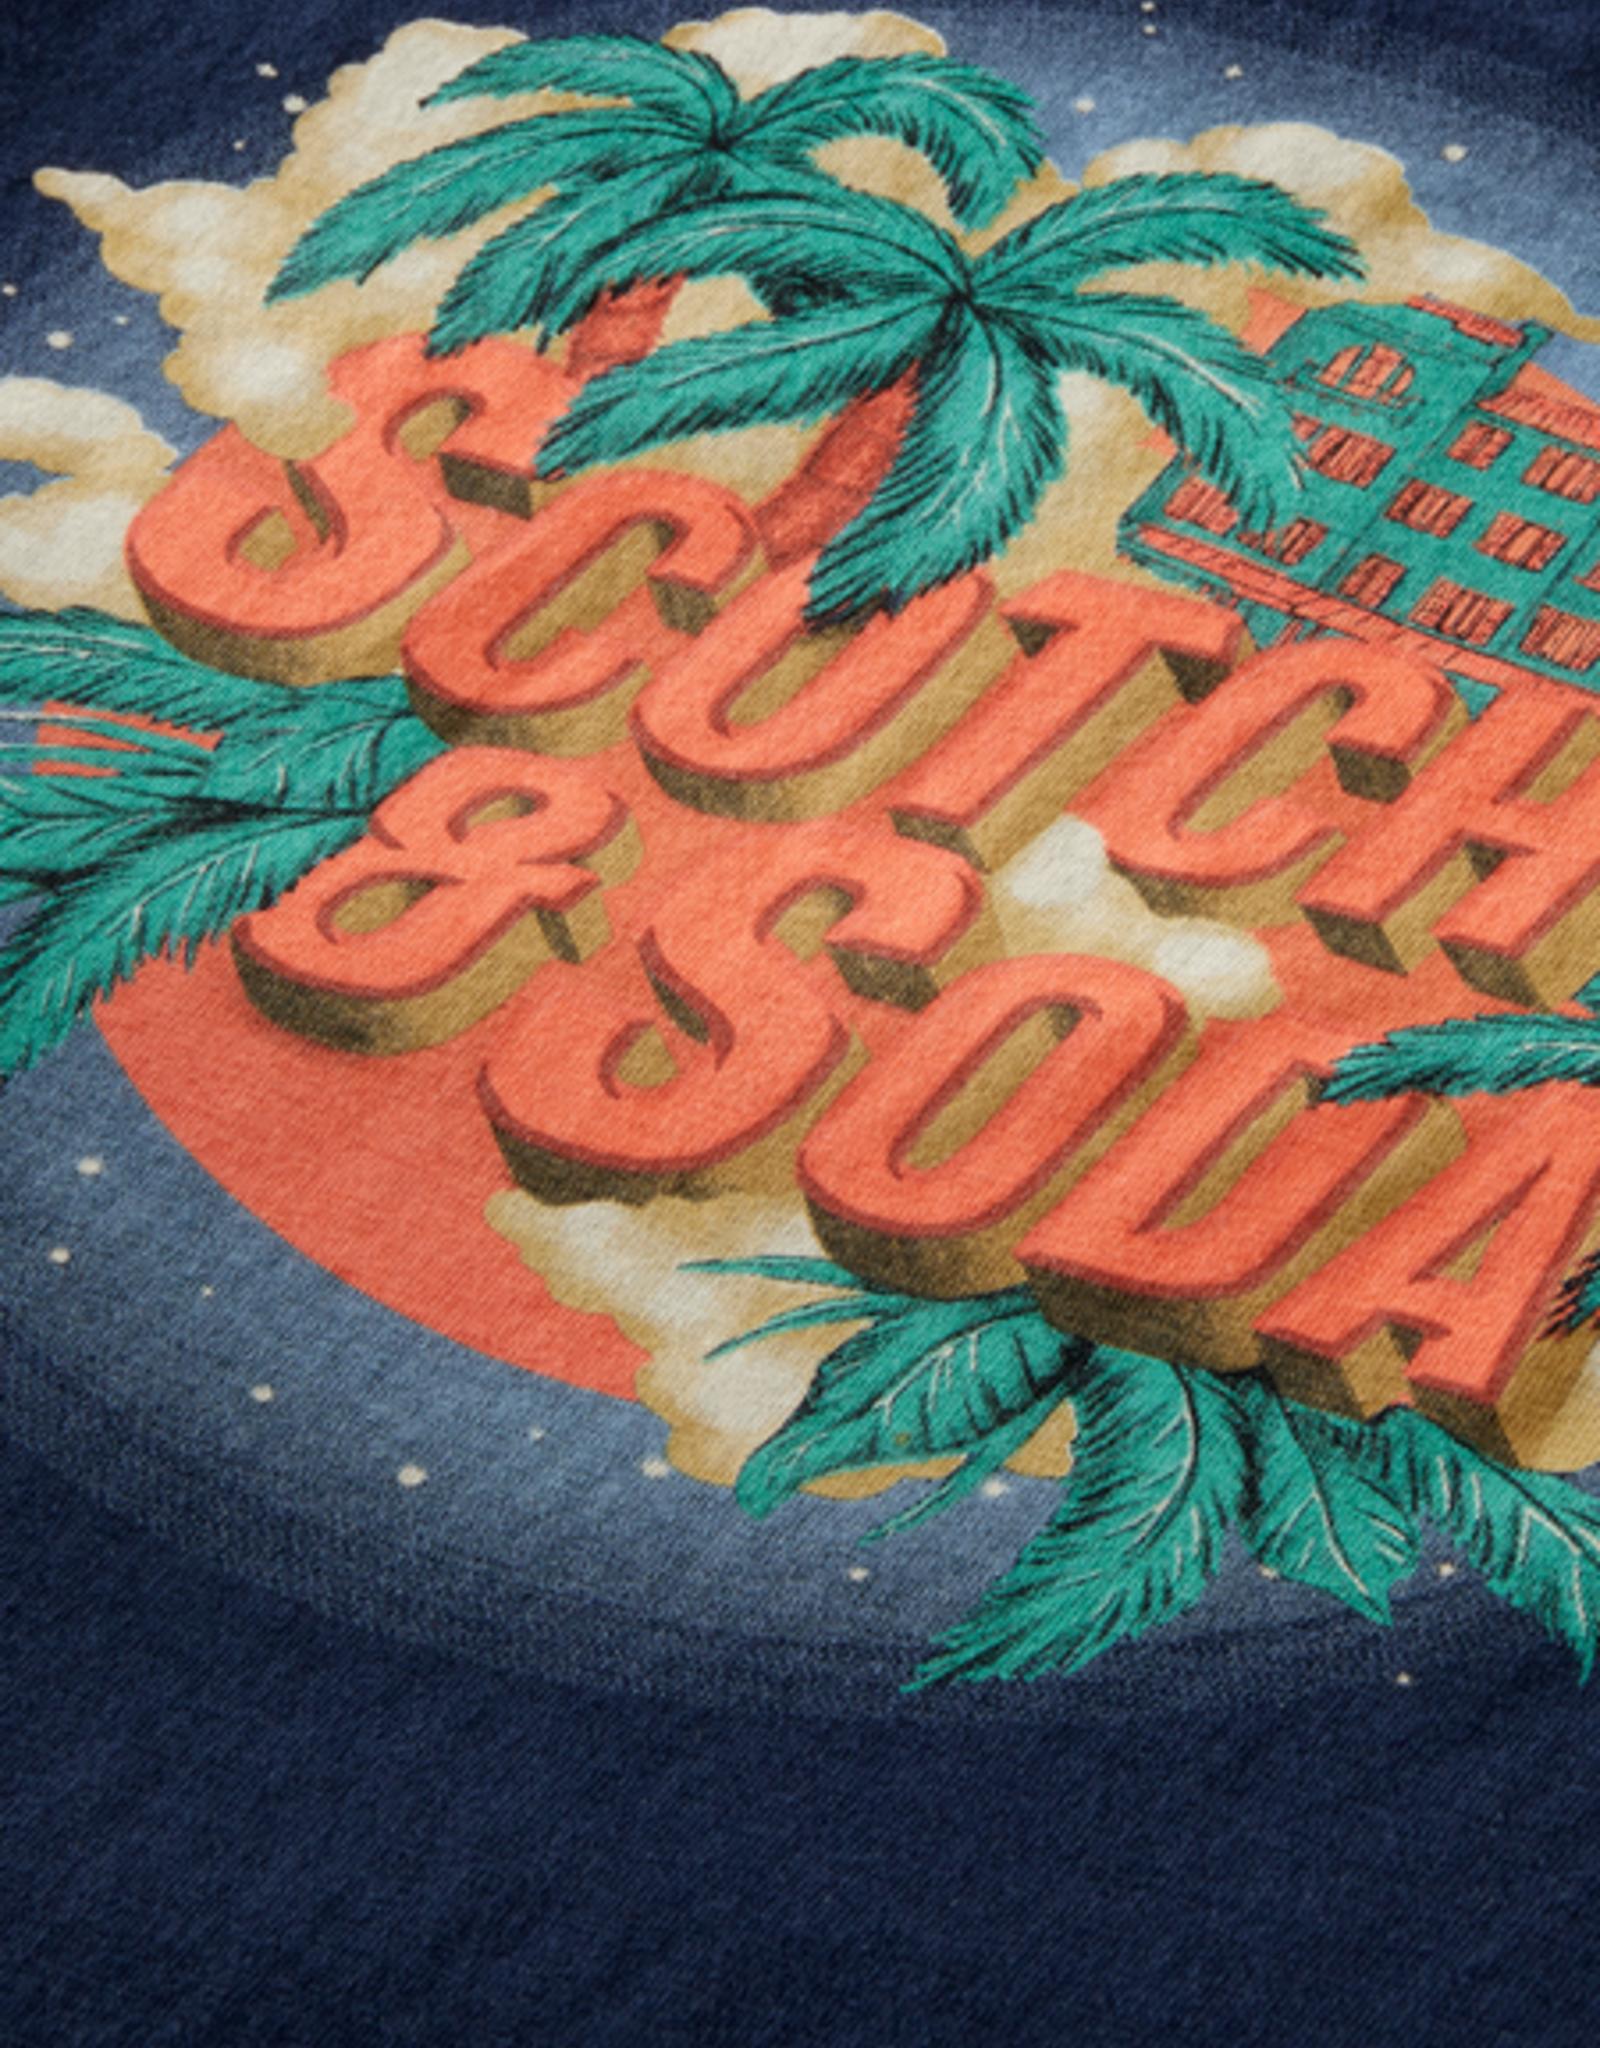 SCOTCH & SODA SCOTCH & SODA Tee col 0002